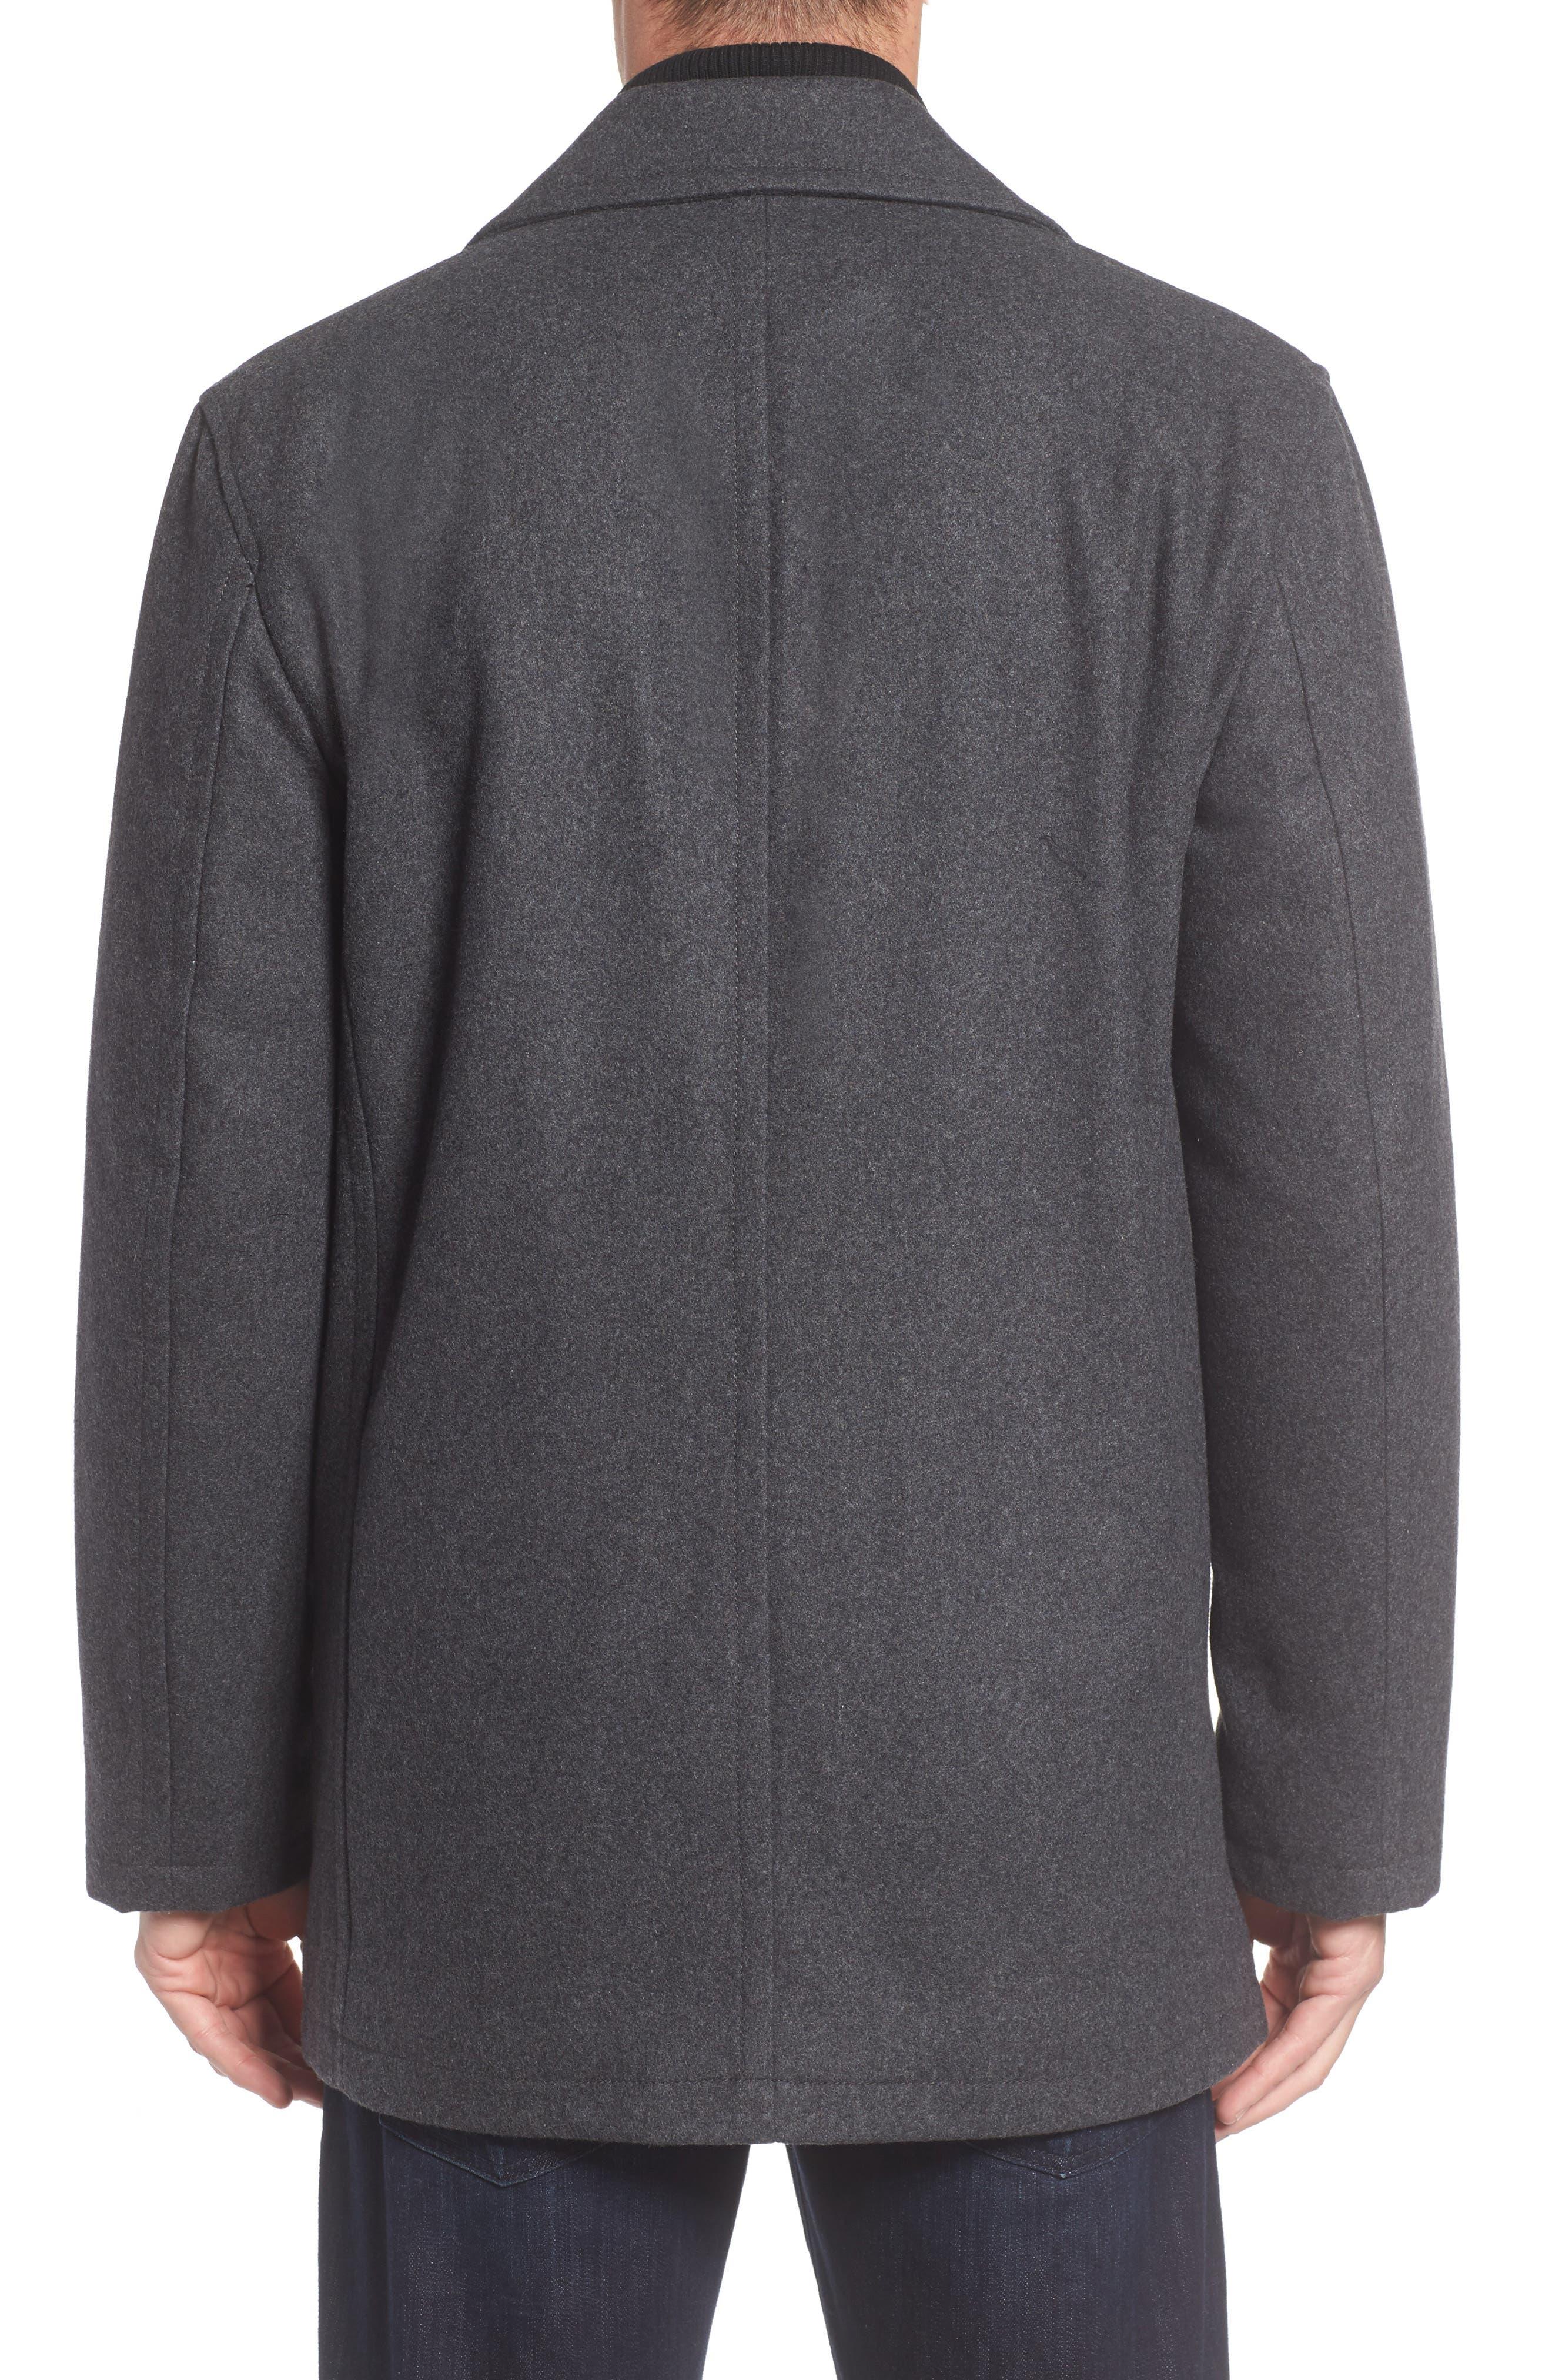 Burnett Wool Blend Peacoat with Front Insert,                             Alternate thumbnail 2, color,                             Charcoal